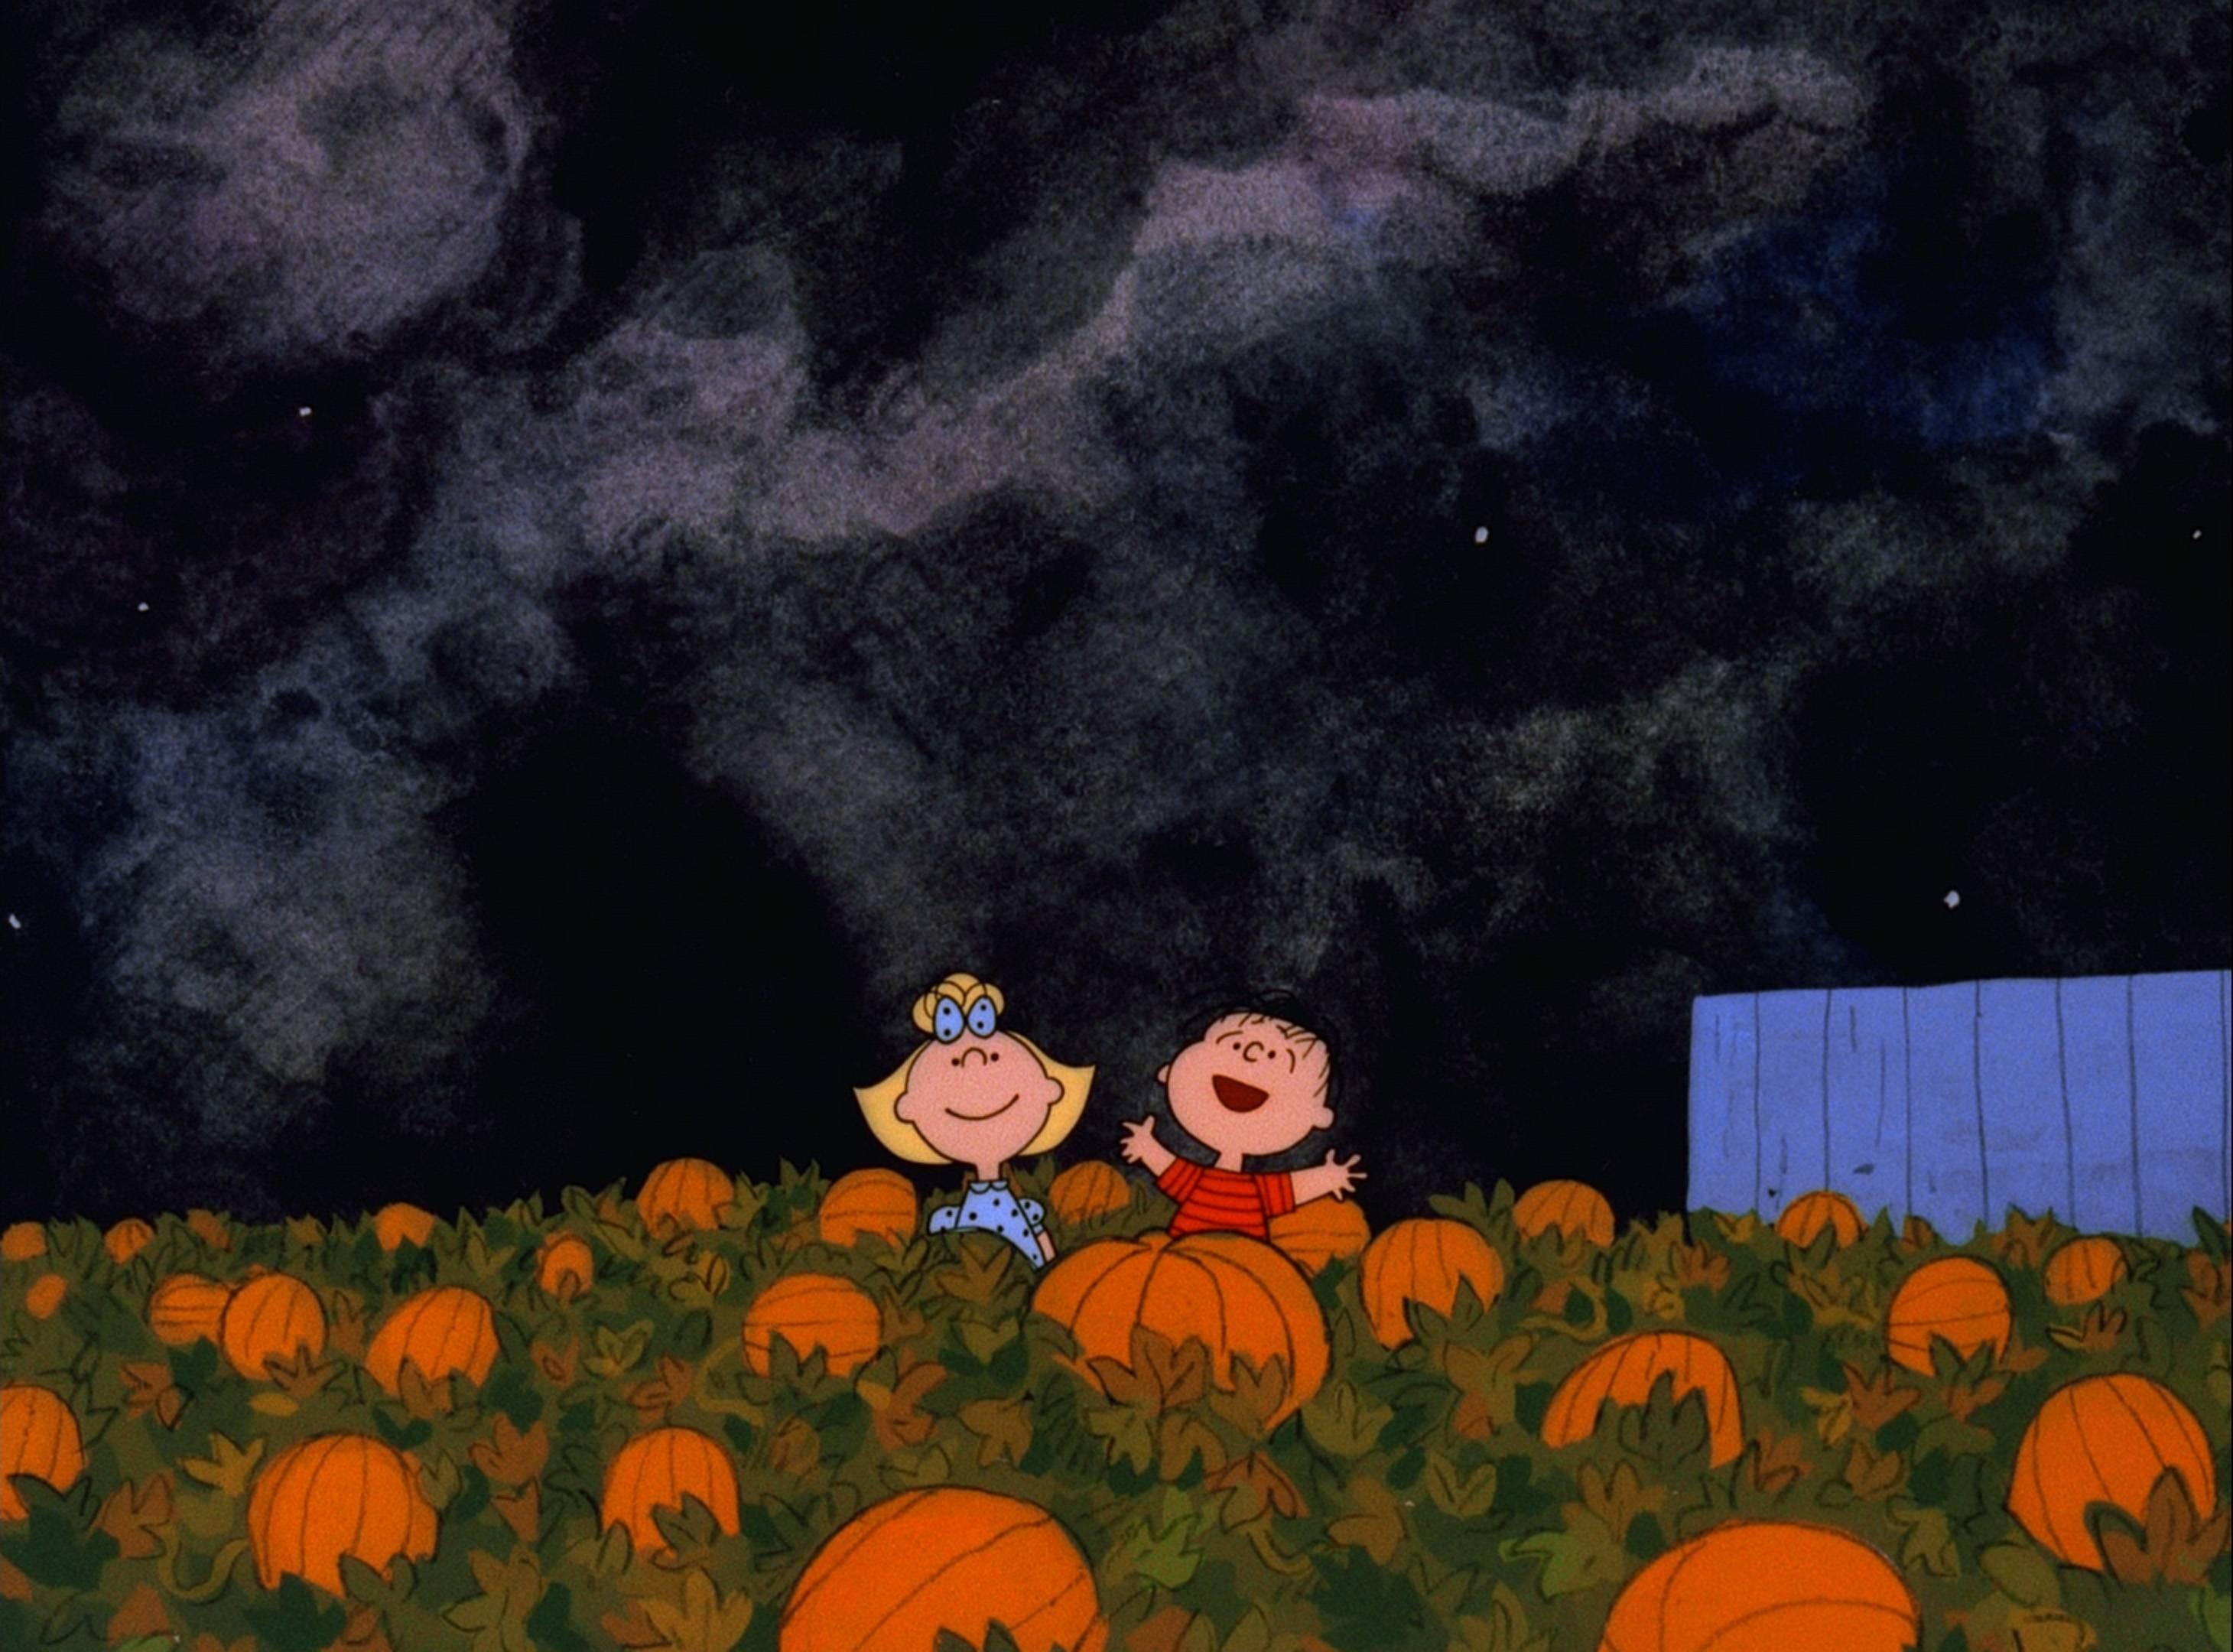 charlie brown halloween wallpaper 2 - media file | pixelstalk